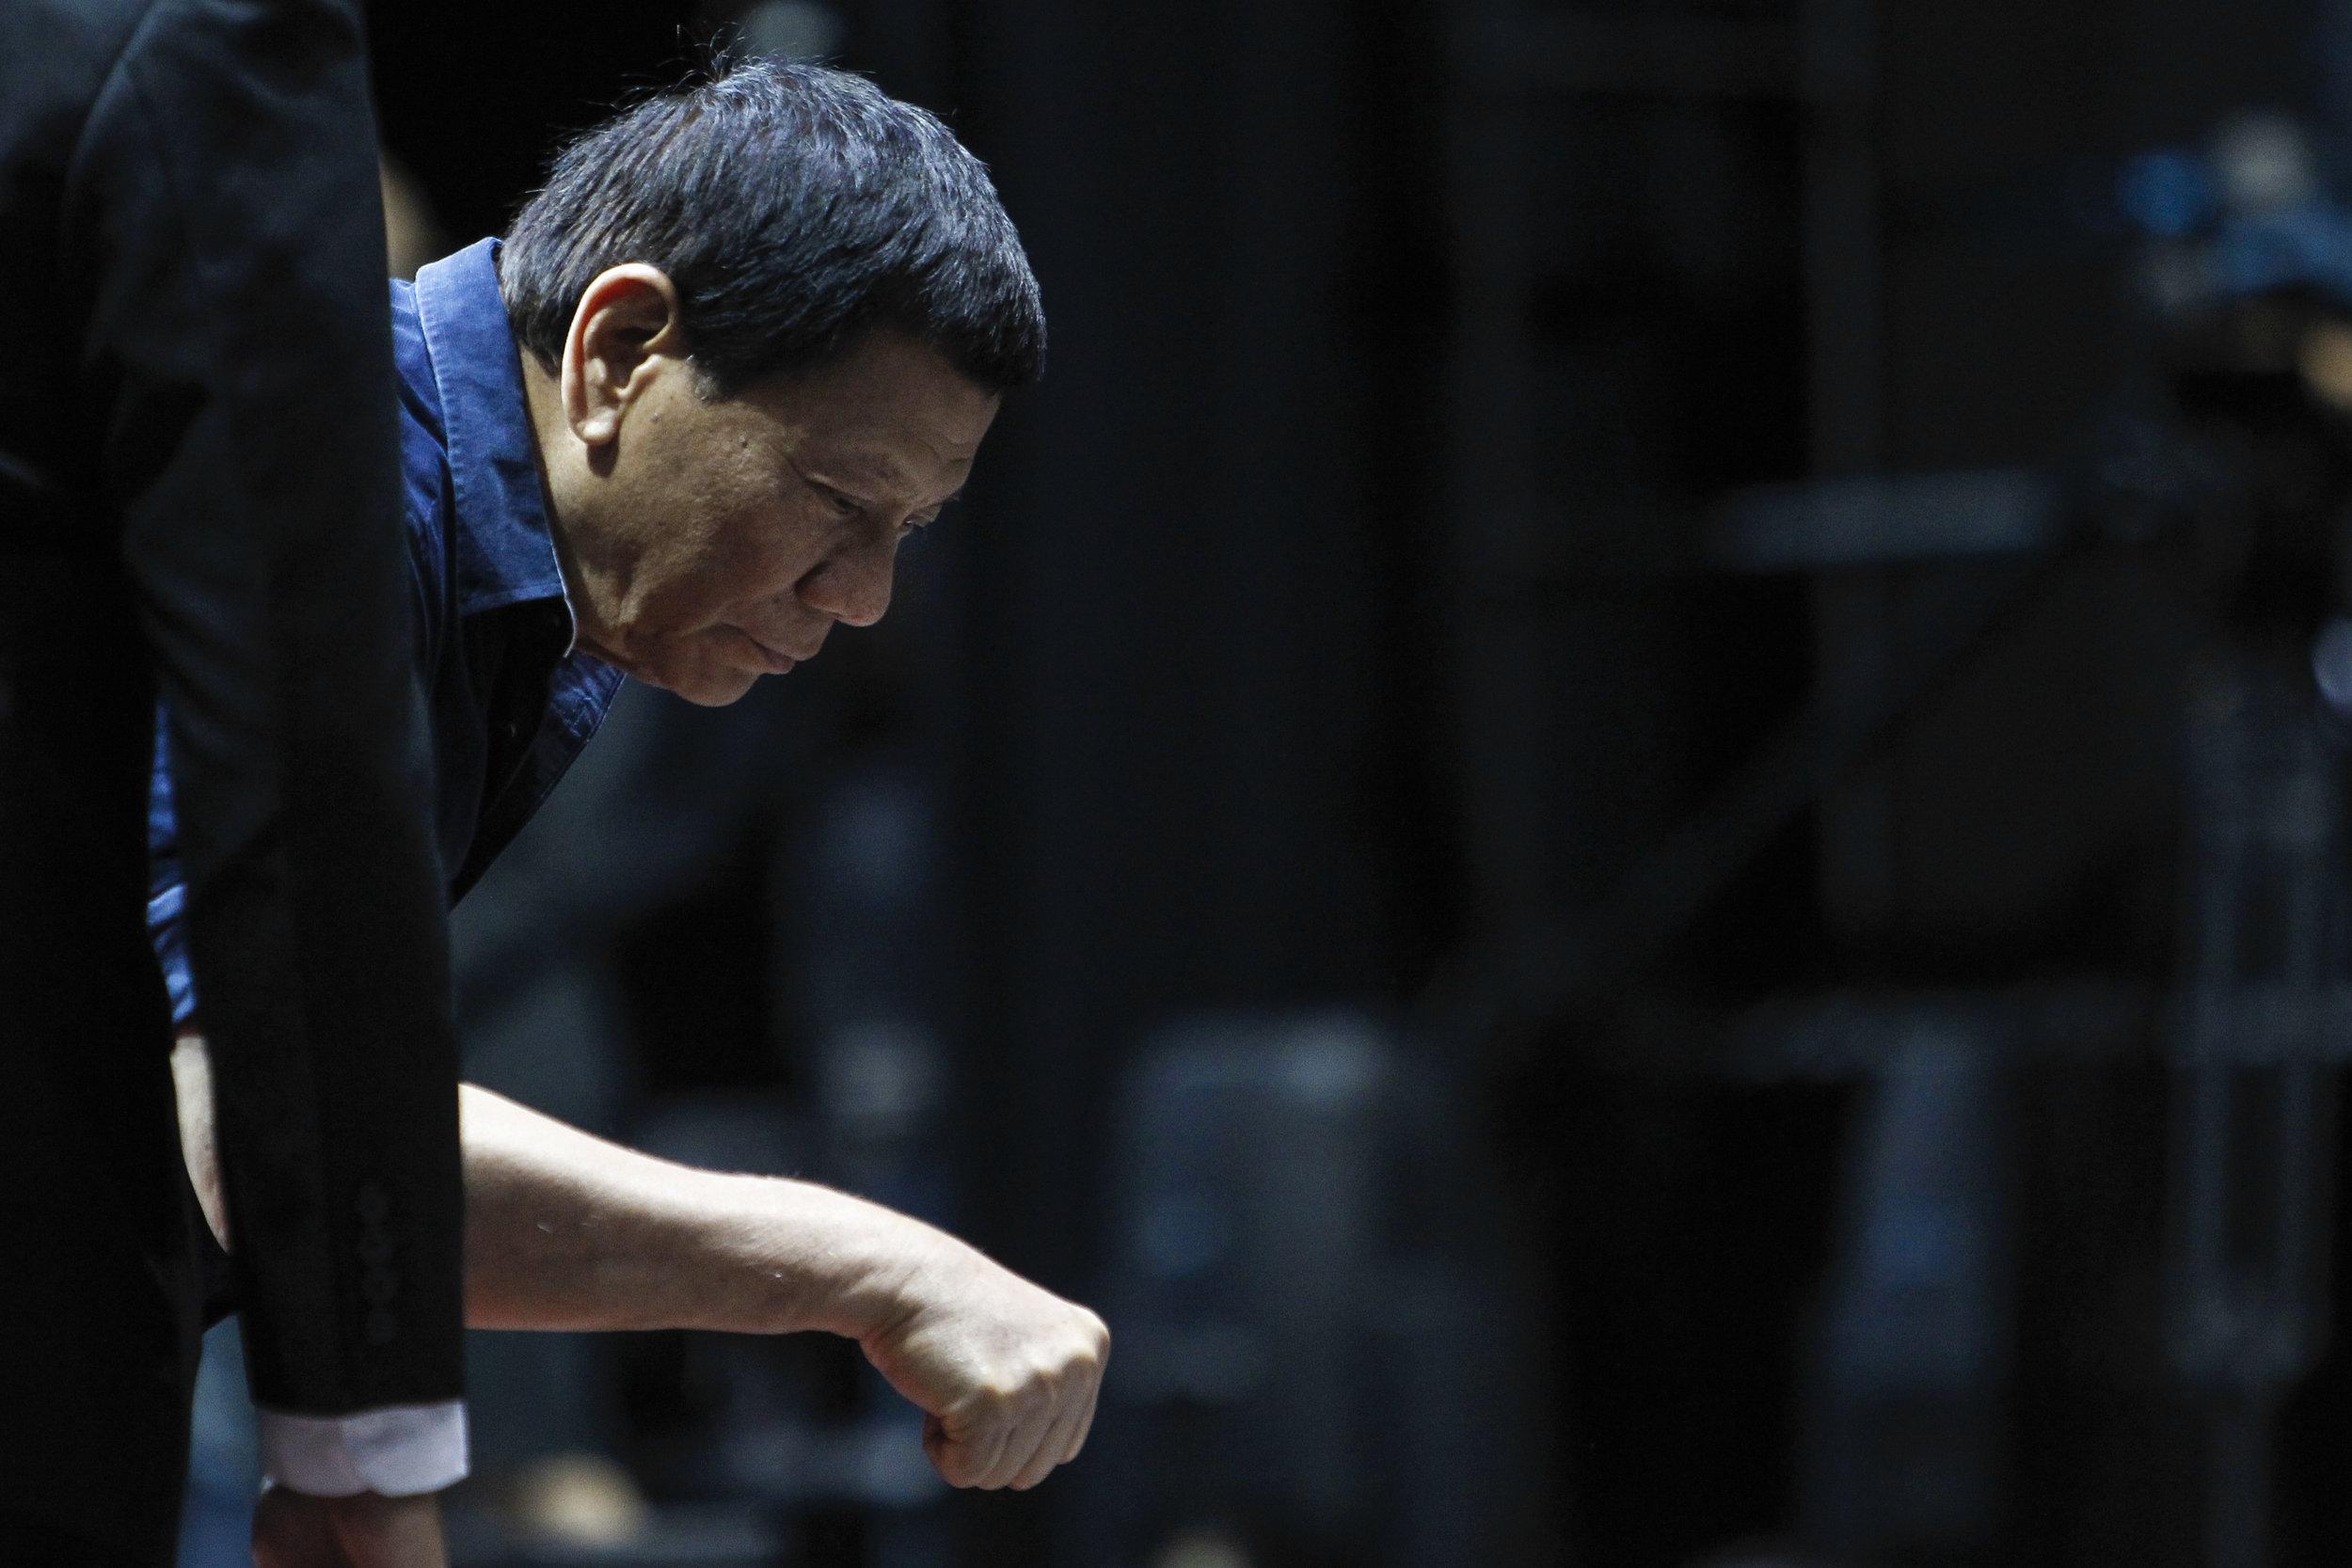 Philippines President Rodrigo Duterte fist bumps a supporter at a community gathering event in Singapore, April 28, 2018. REUTERS/Feline Lim